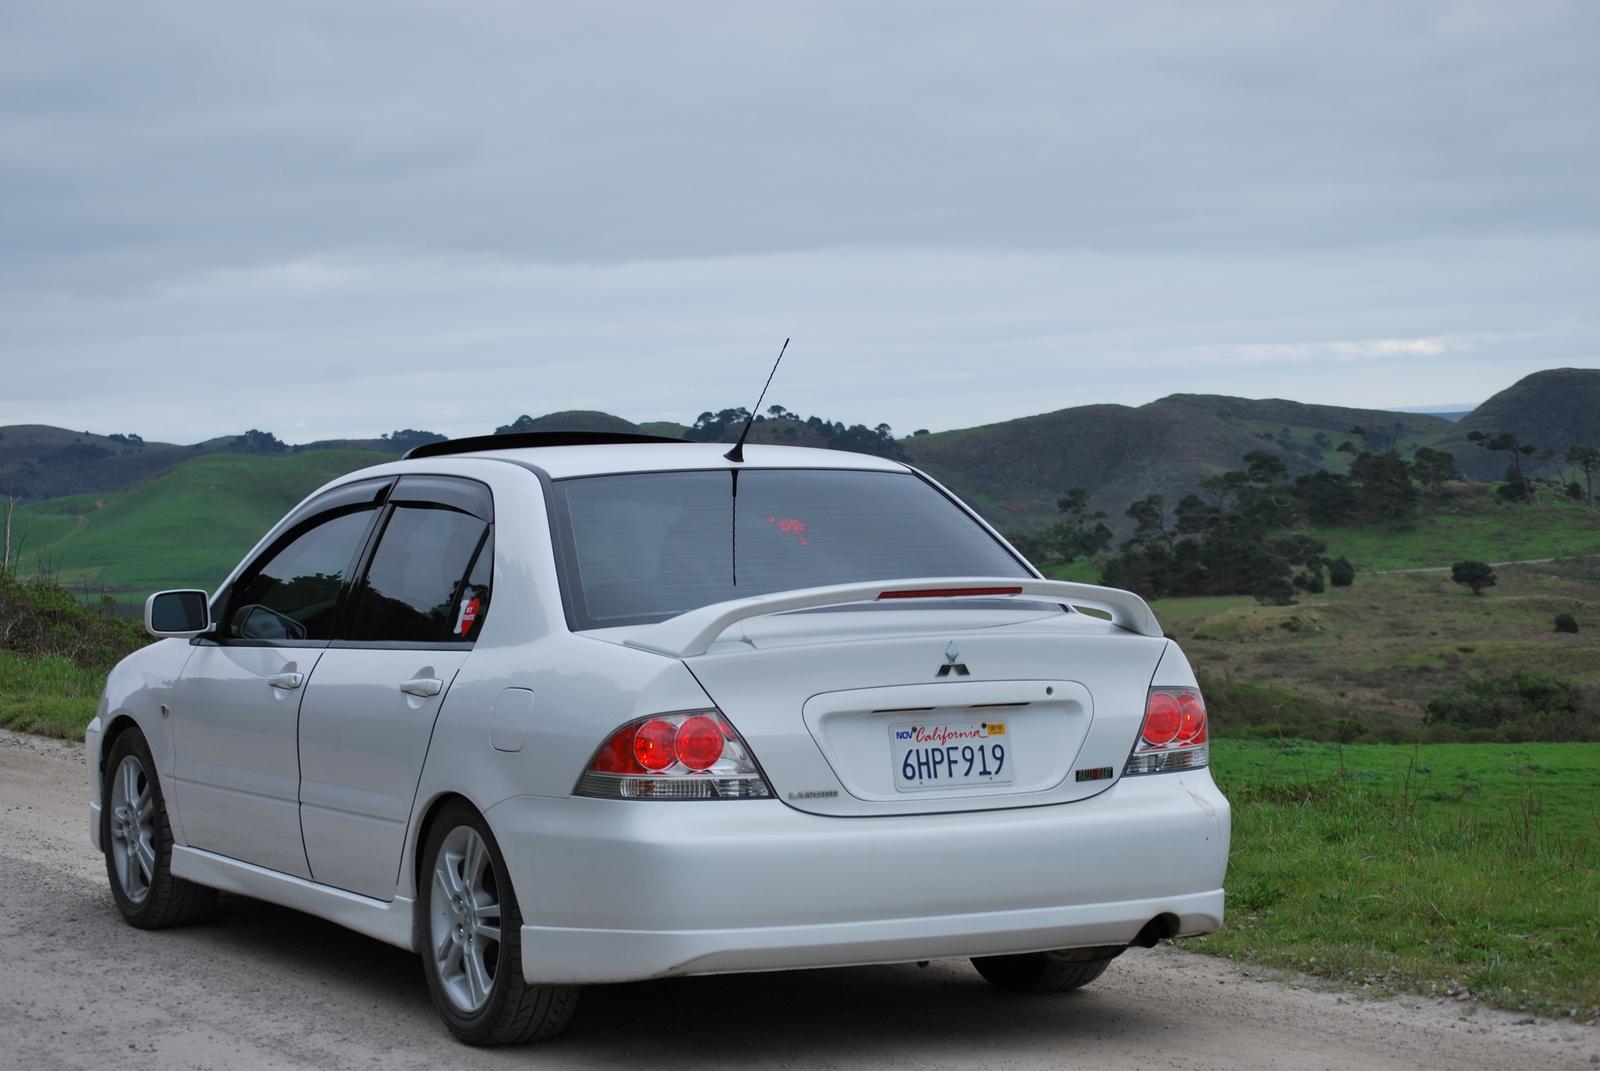 2004 Mitsubishi Lancer Pictures Cargurus